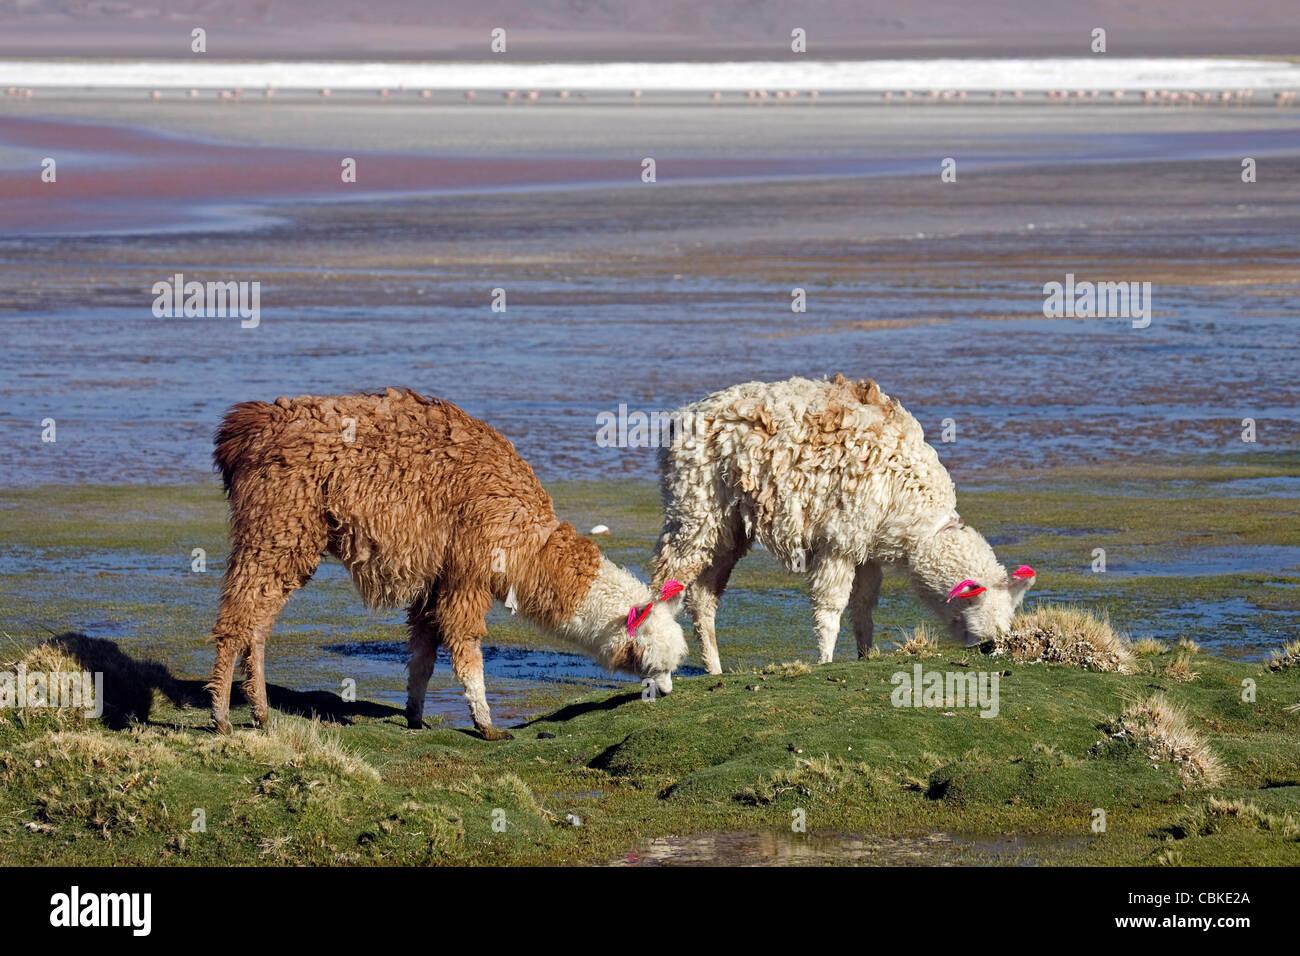 Two Llamas (Lama glama) with ear tassels on shoreline of salt lake Laguna Colorada on the Altiplano, Bolivia - Stock Image